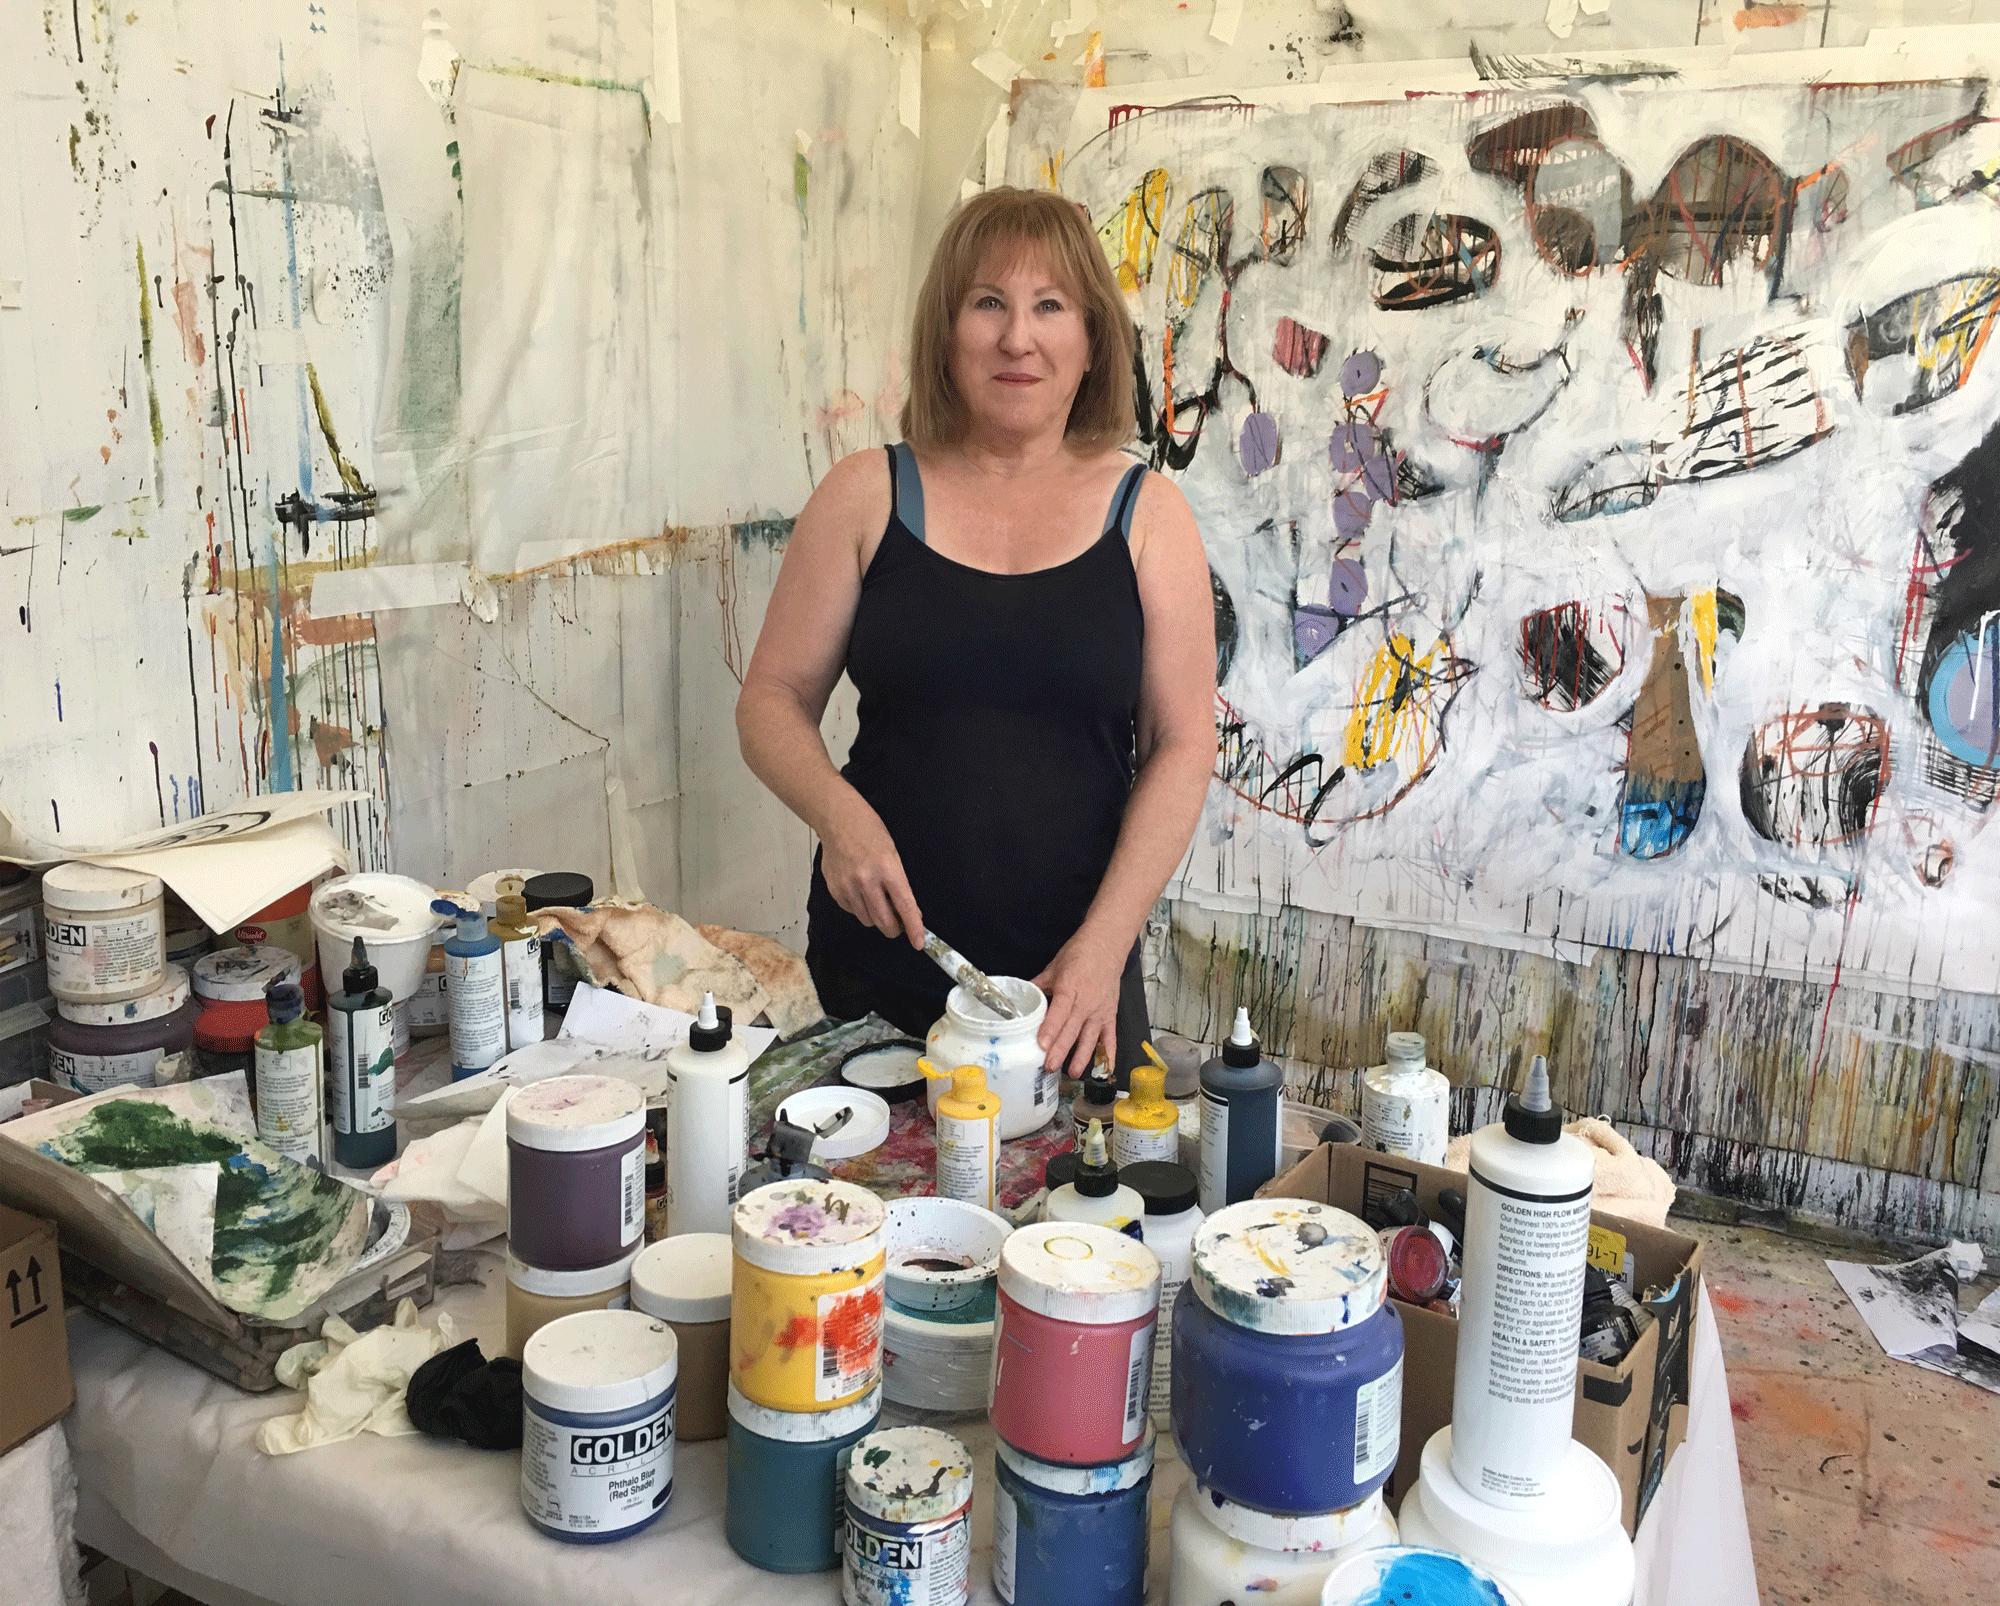 Susan in her studio in Los Angeles